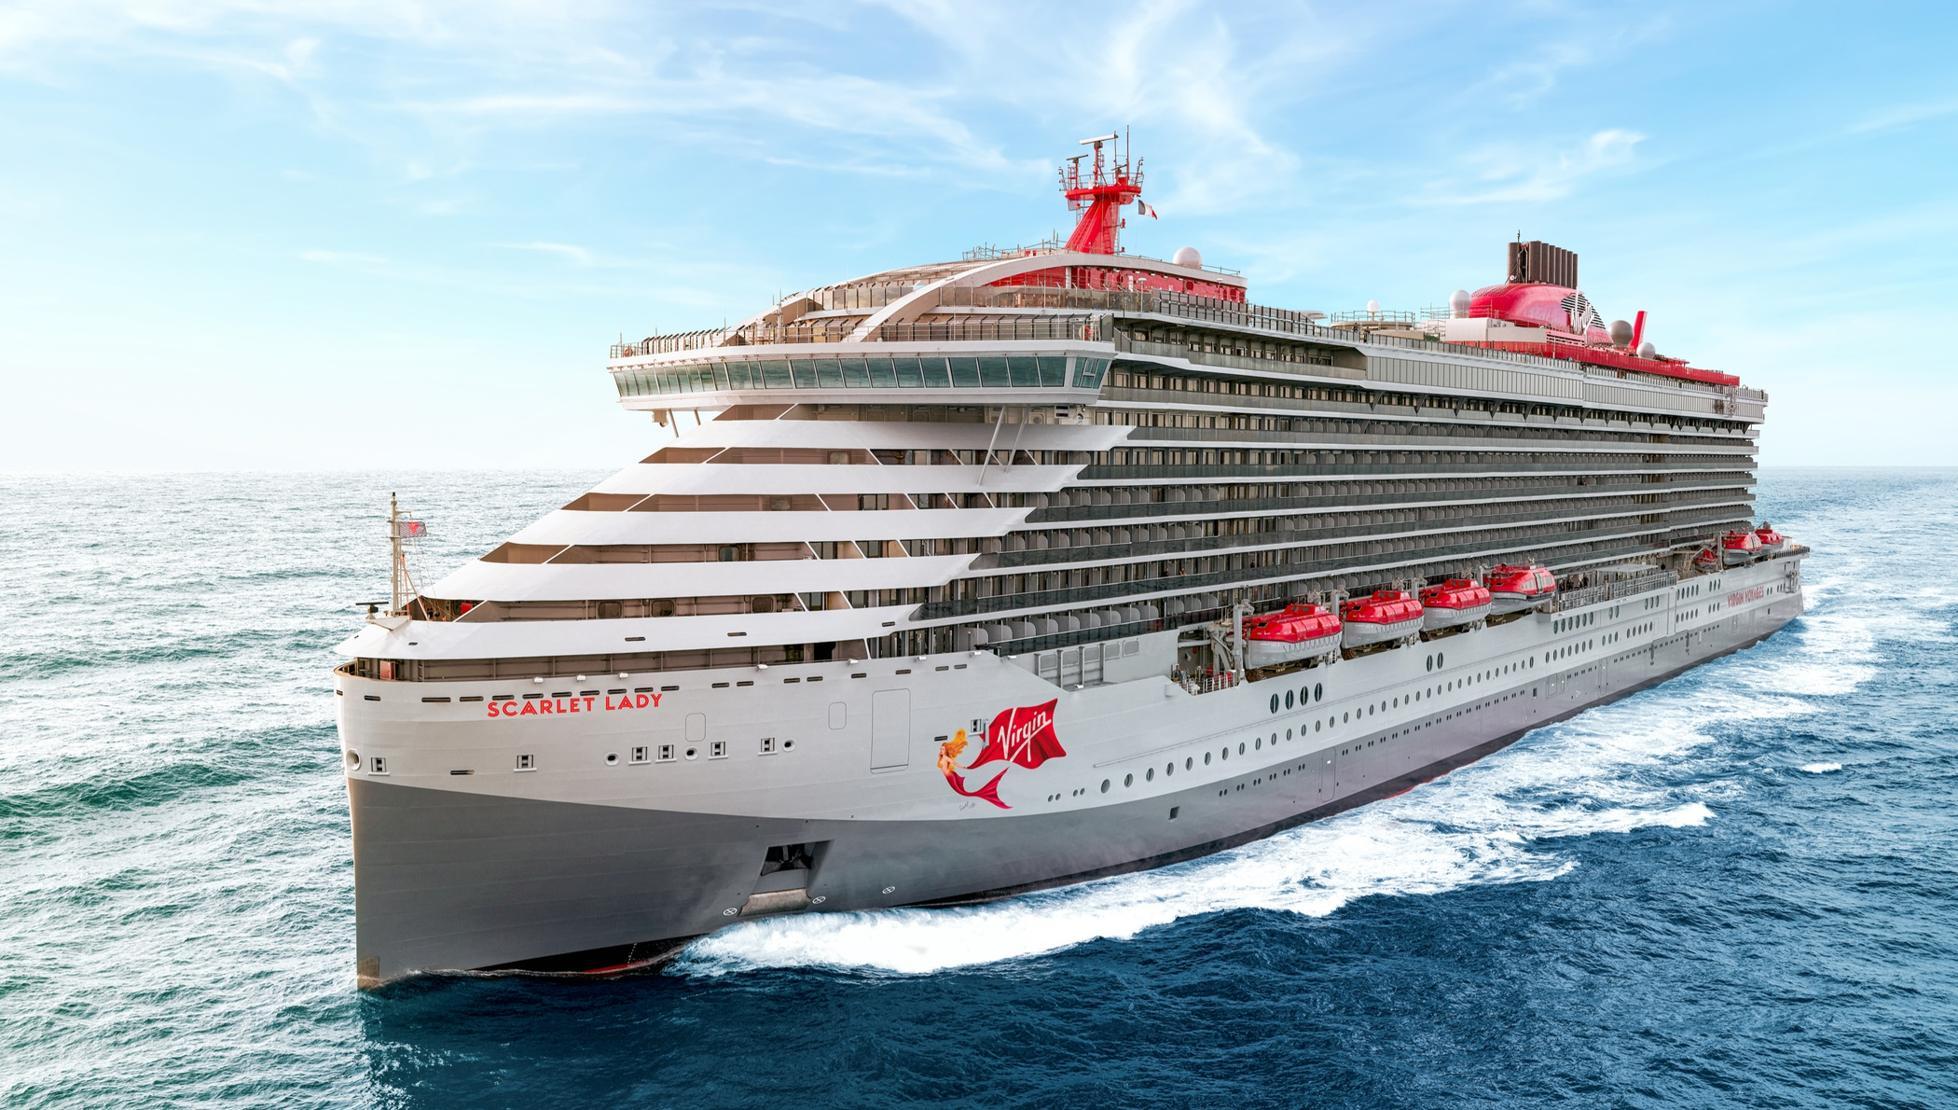 Covid vaccinated cruise